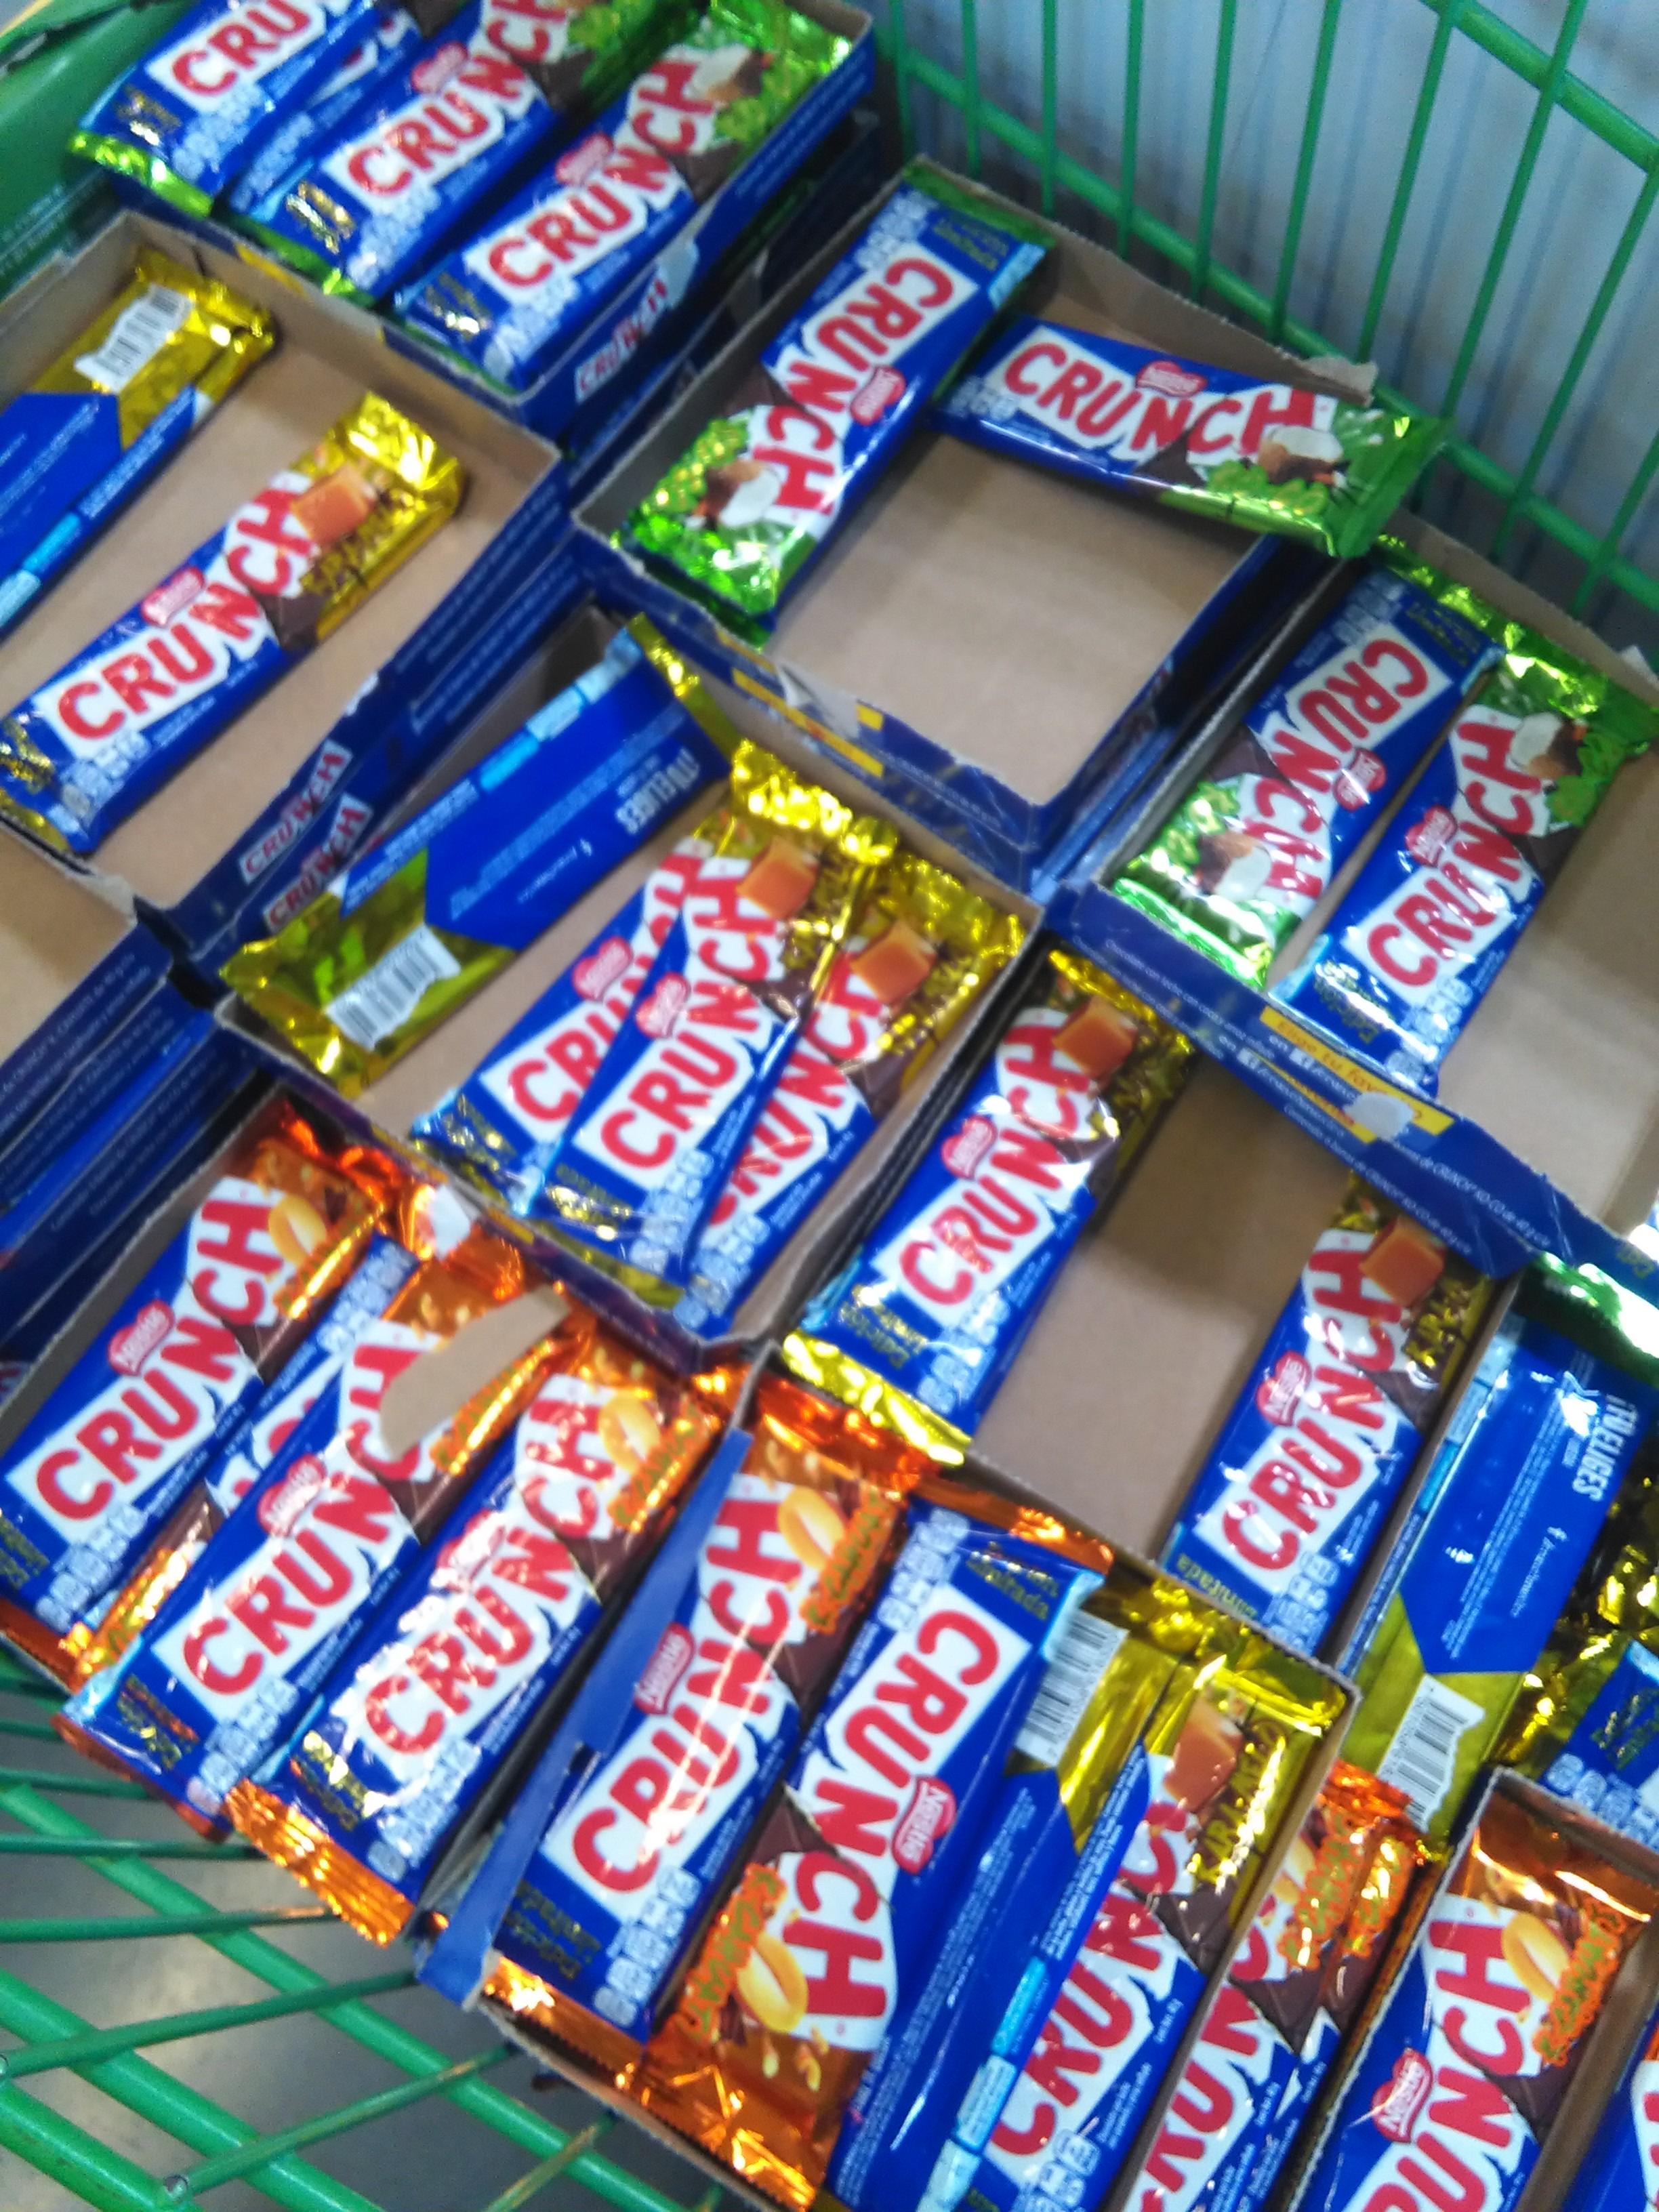 Bodega Aurrerá Escobedo:chocolate Crunch a $5.02, plancha Taurus a $75.02 y más